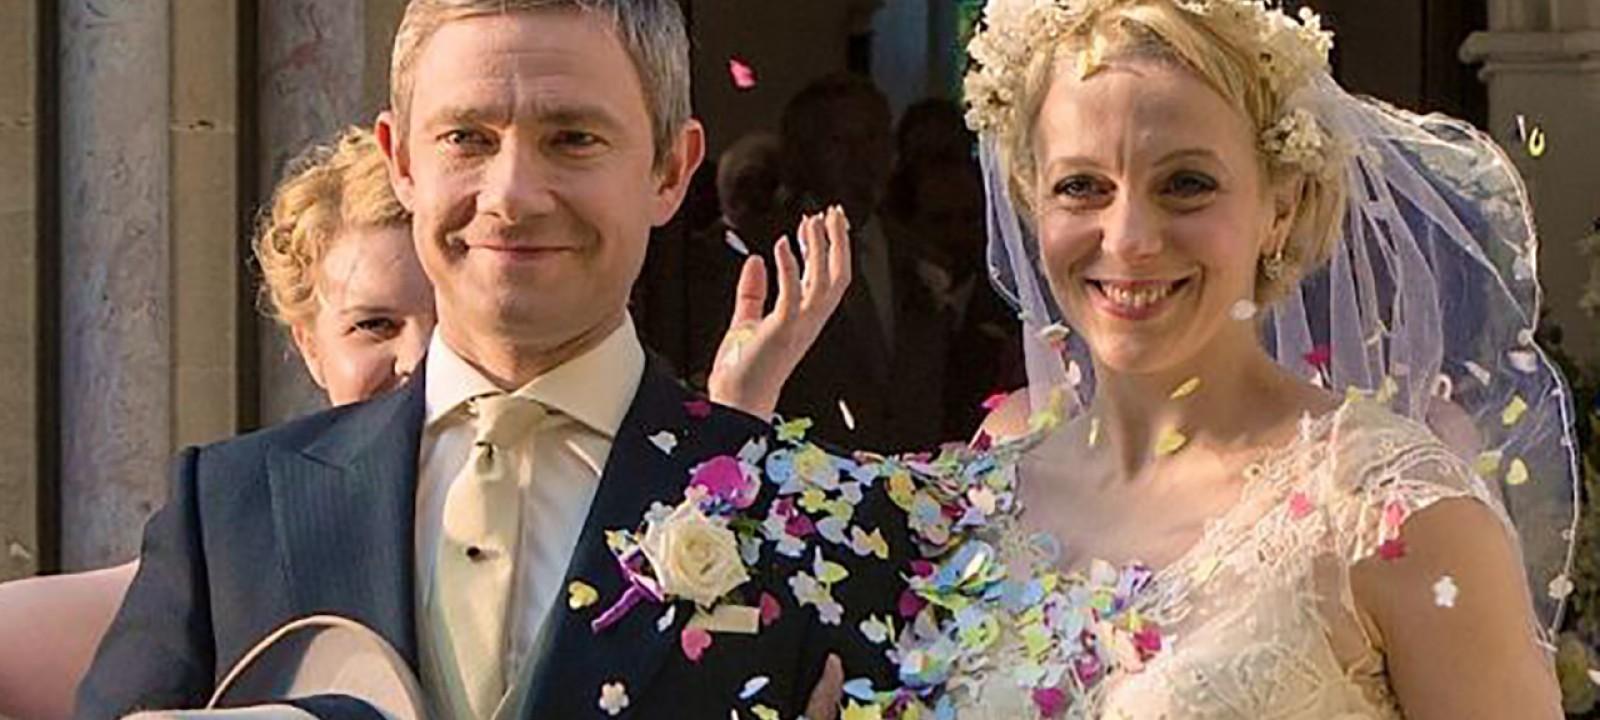 Sherlock, 302 – Martin Freeman, Amanda Abbington and Benedict Cumberbatch